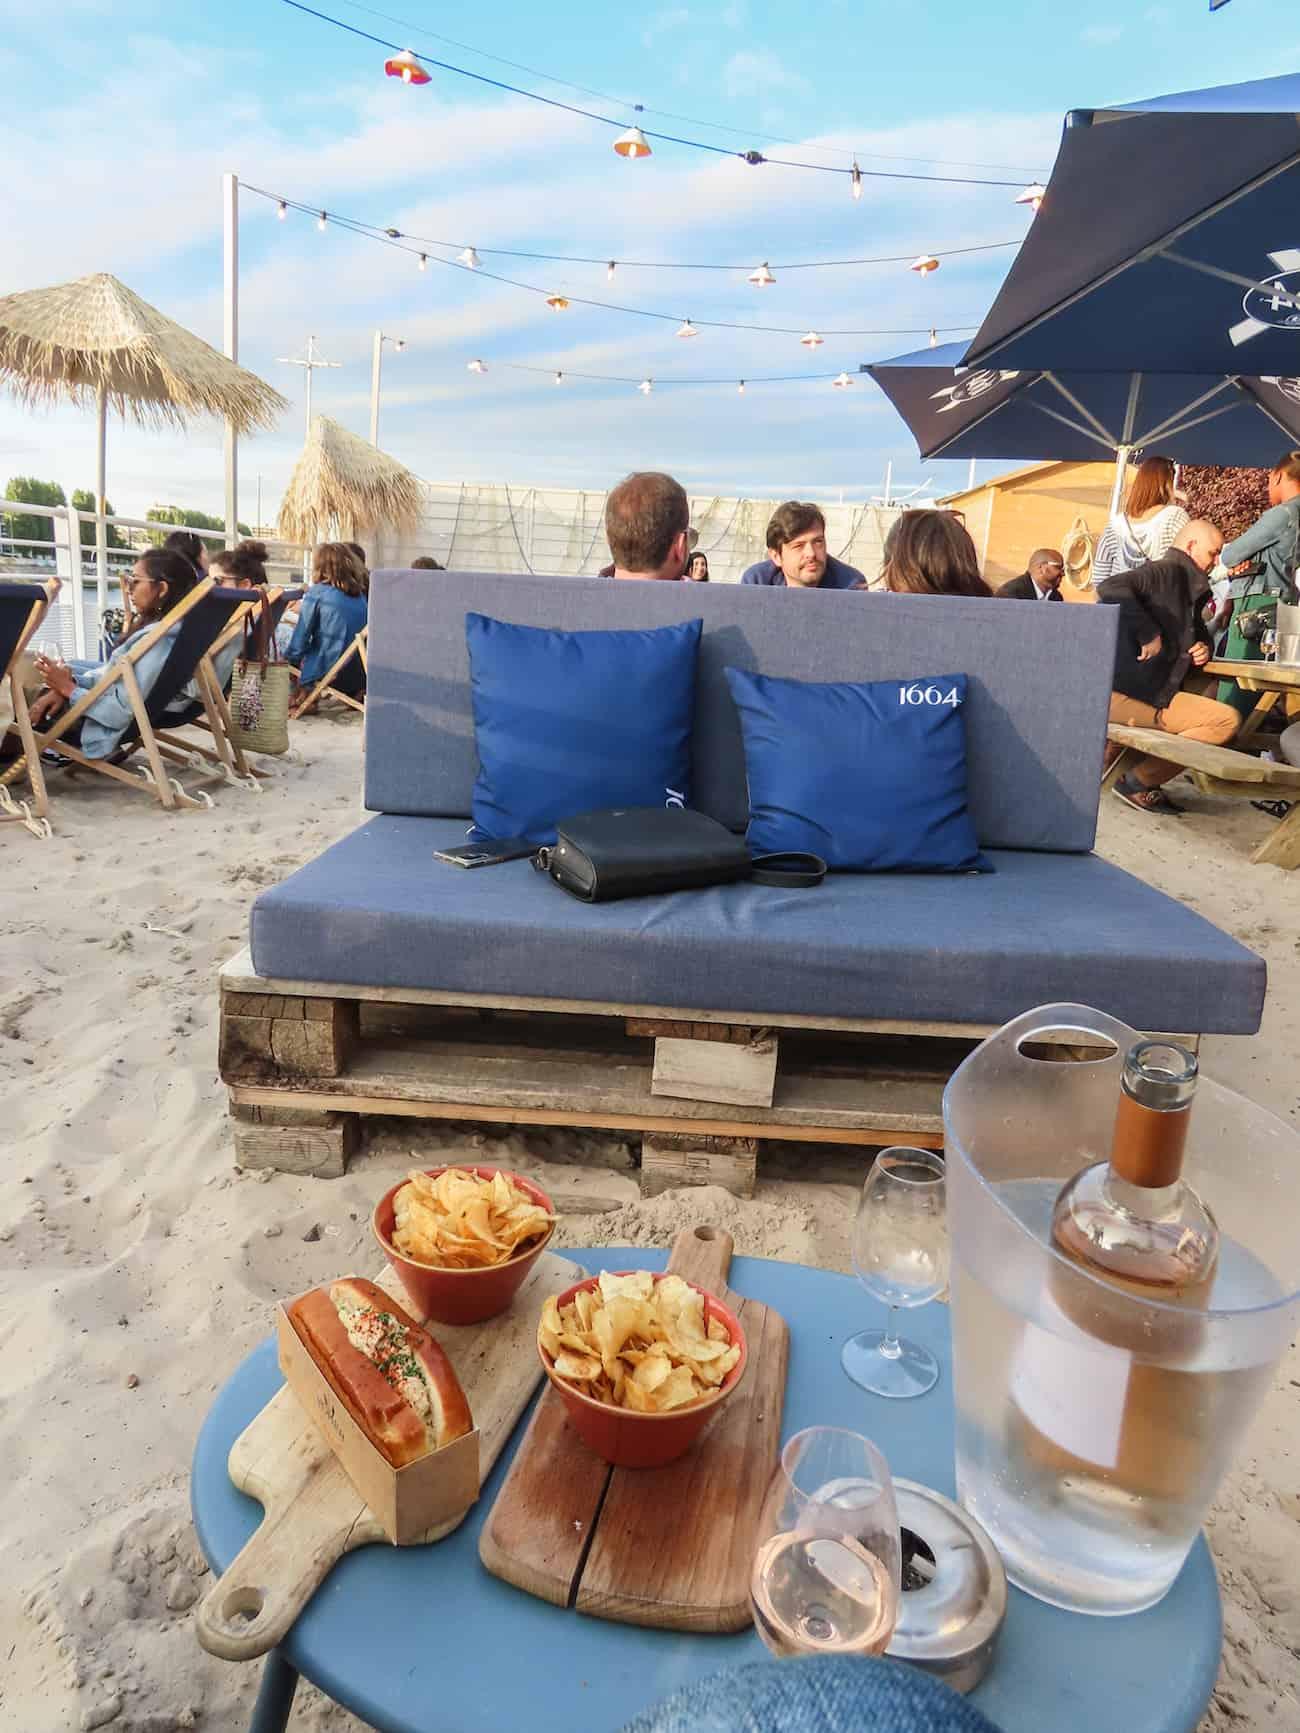 polpo-plage-terrasse-paris-bord-seine-restaurant-16